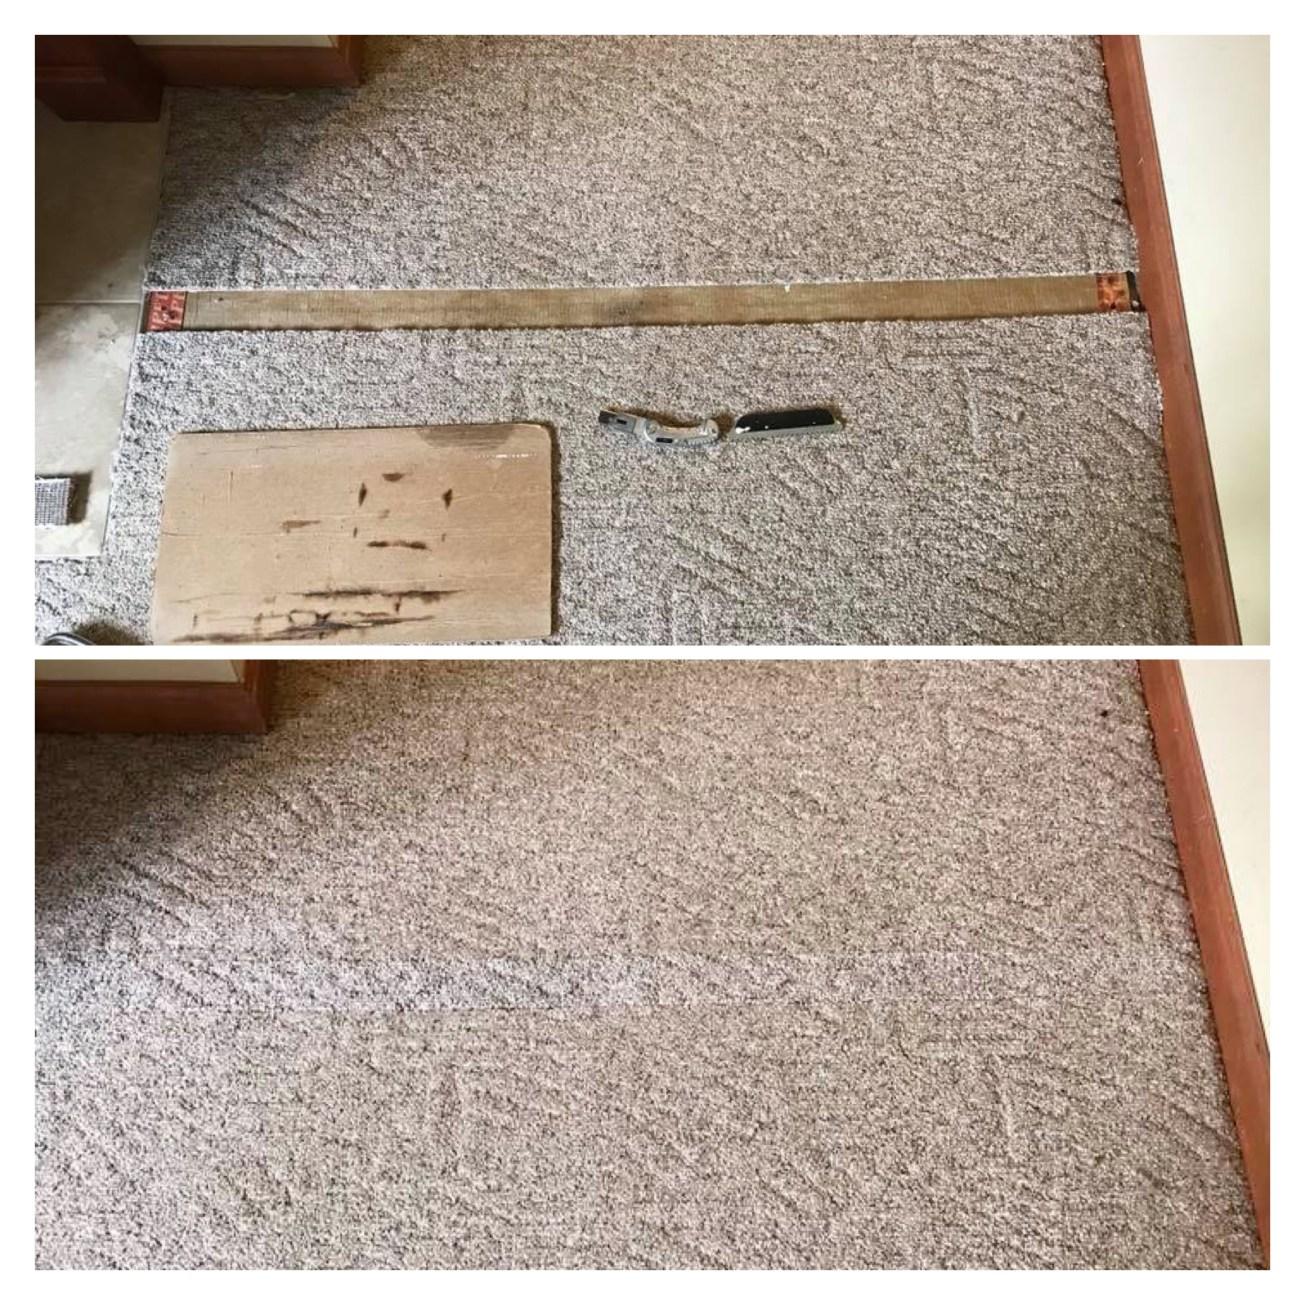 Carpet repair service in Edwardsville, IL